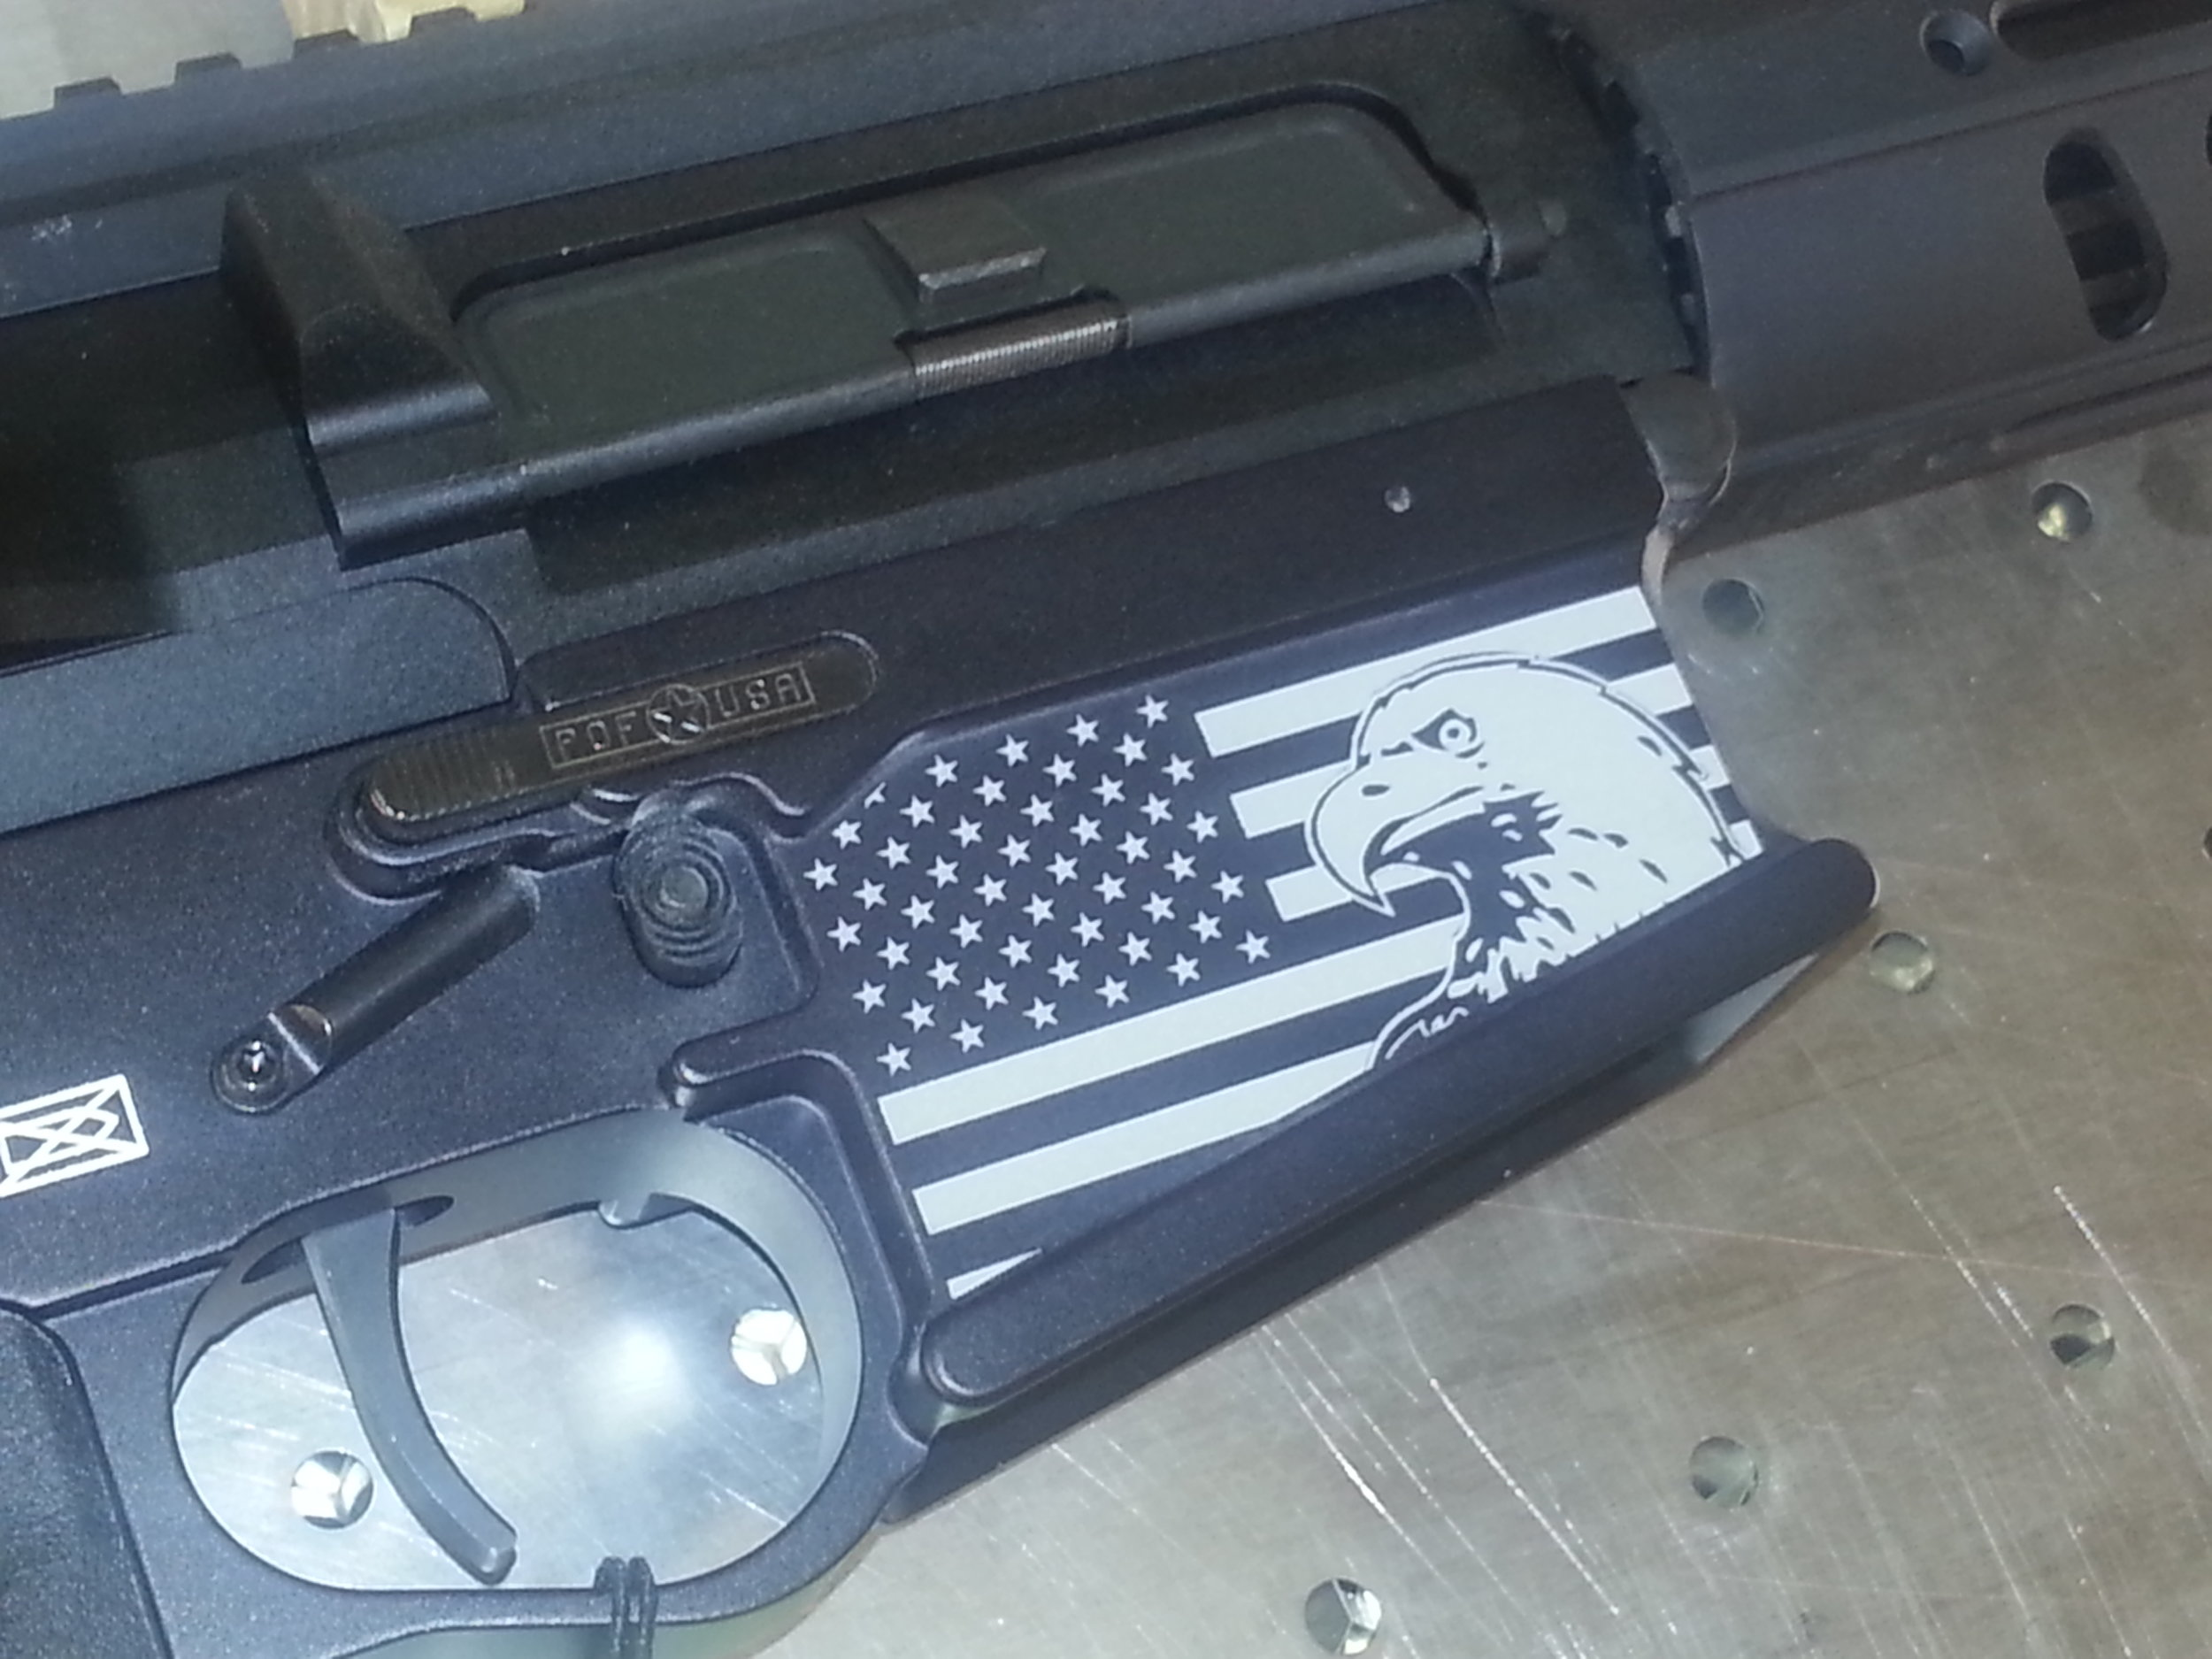 Copy of Custom Engraved Assault Rifle - Personalized Assault Rifle - Firearm Projects from Engrave It Houston